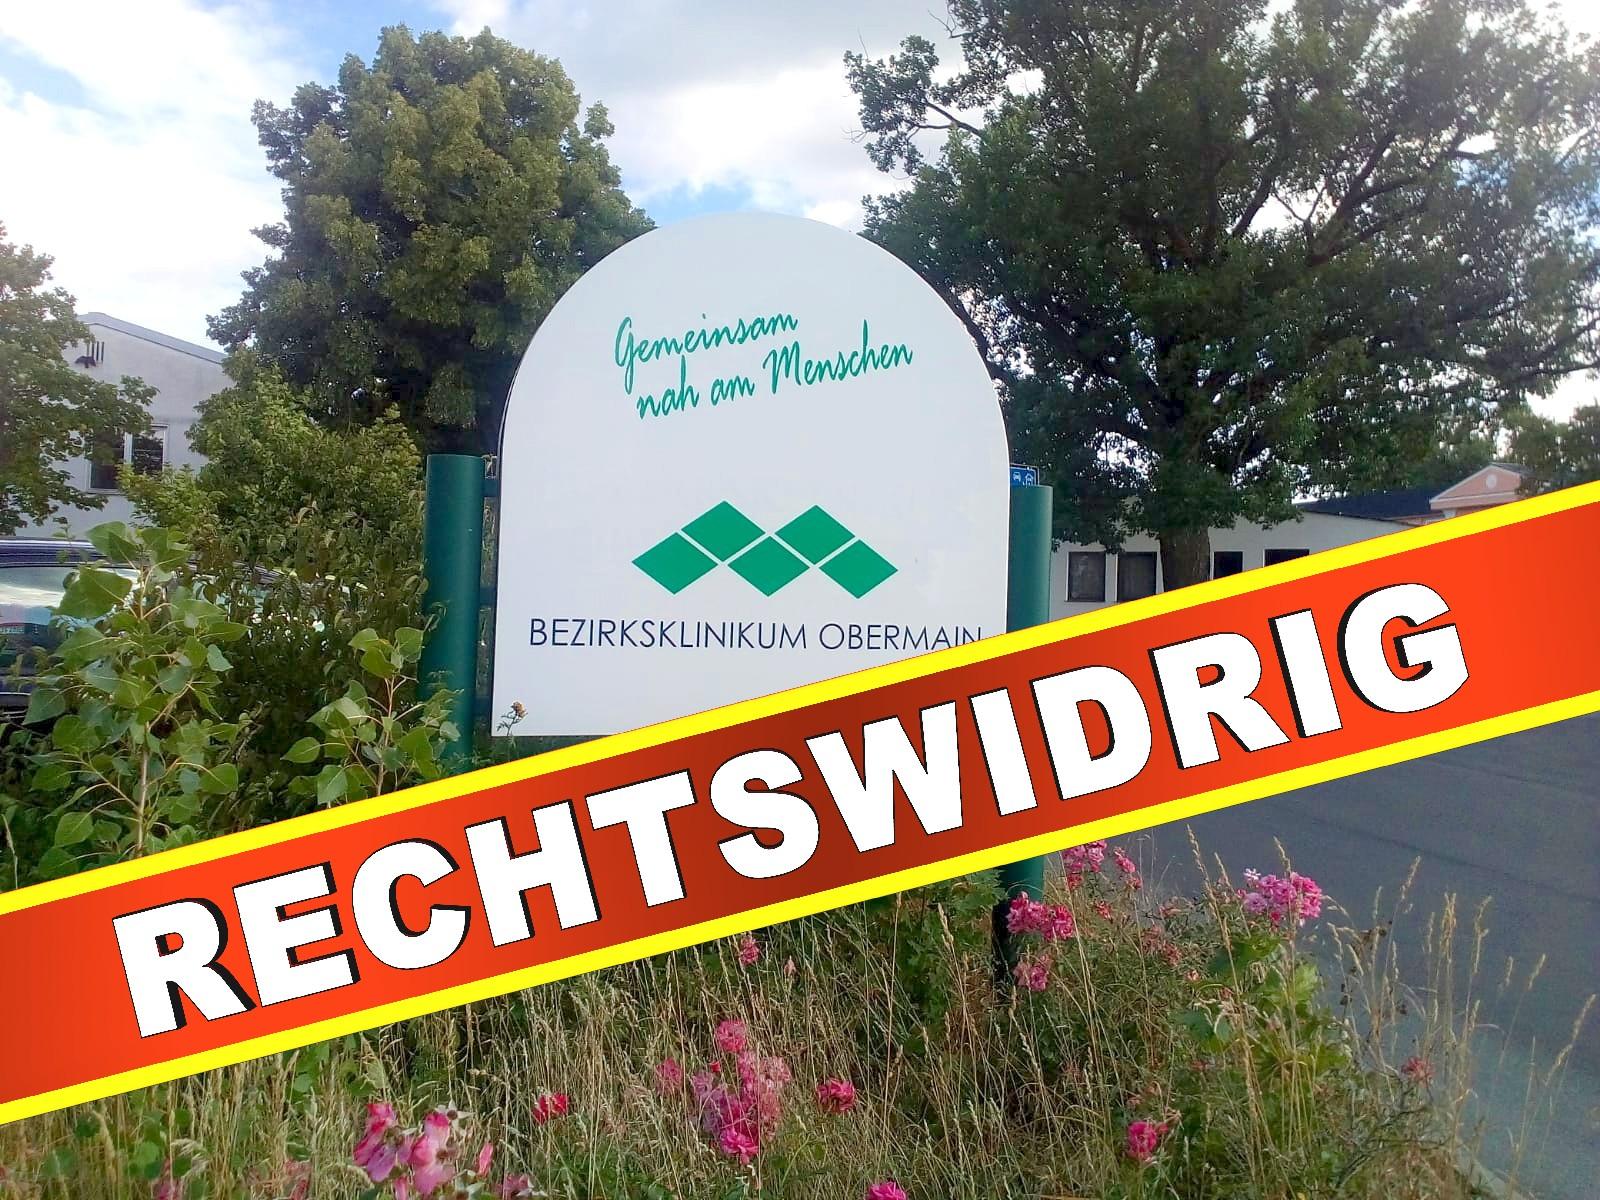 Bezirksklinikum Obermain Kutzenberg, 96250 Ebensfeld Psychiatrie Polizei Krankenhaus (31)